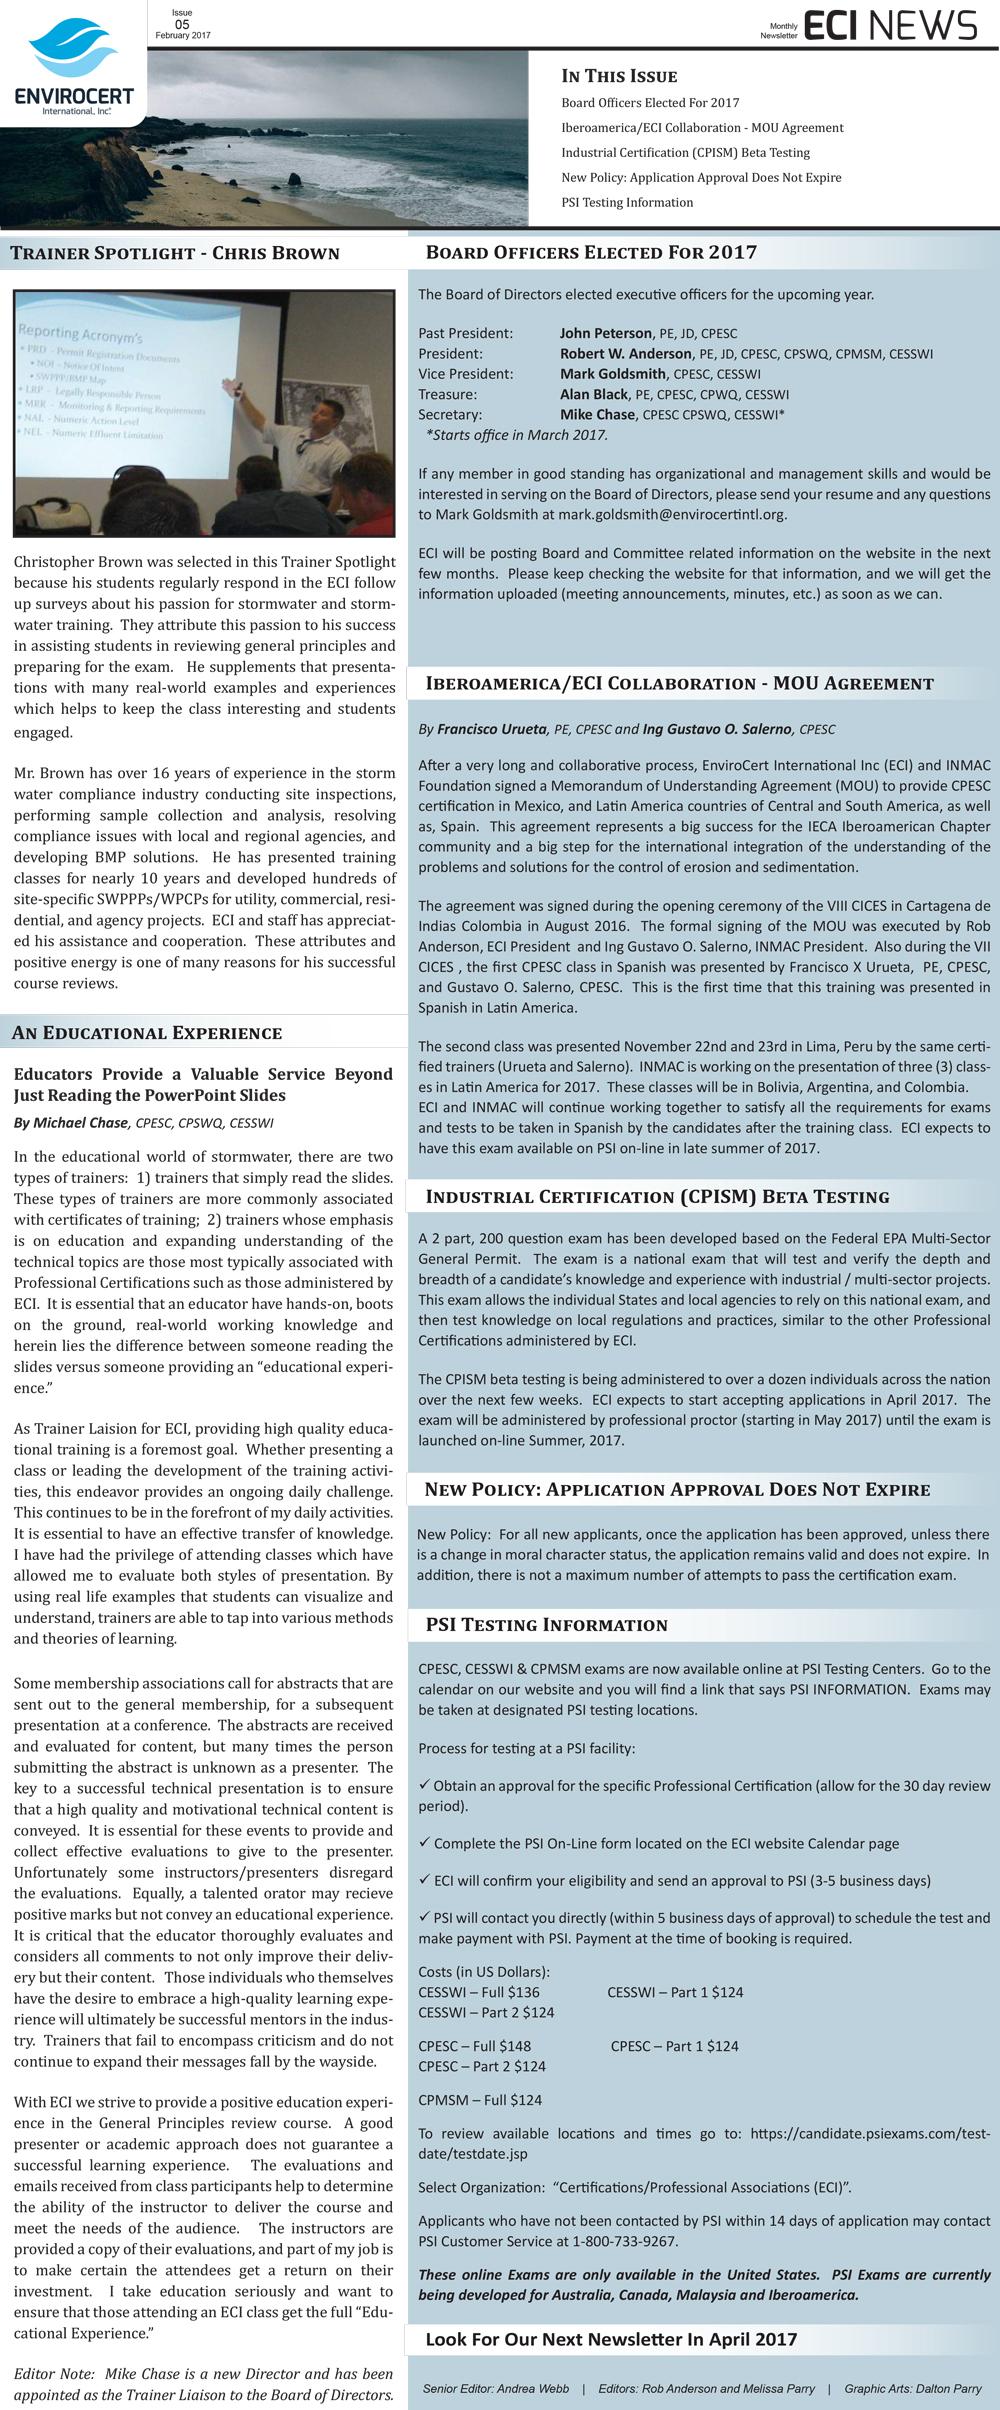 ECI News